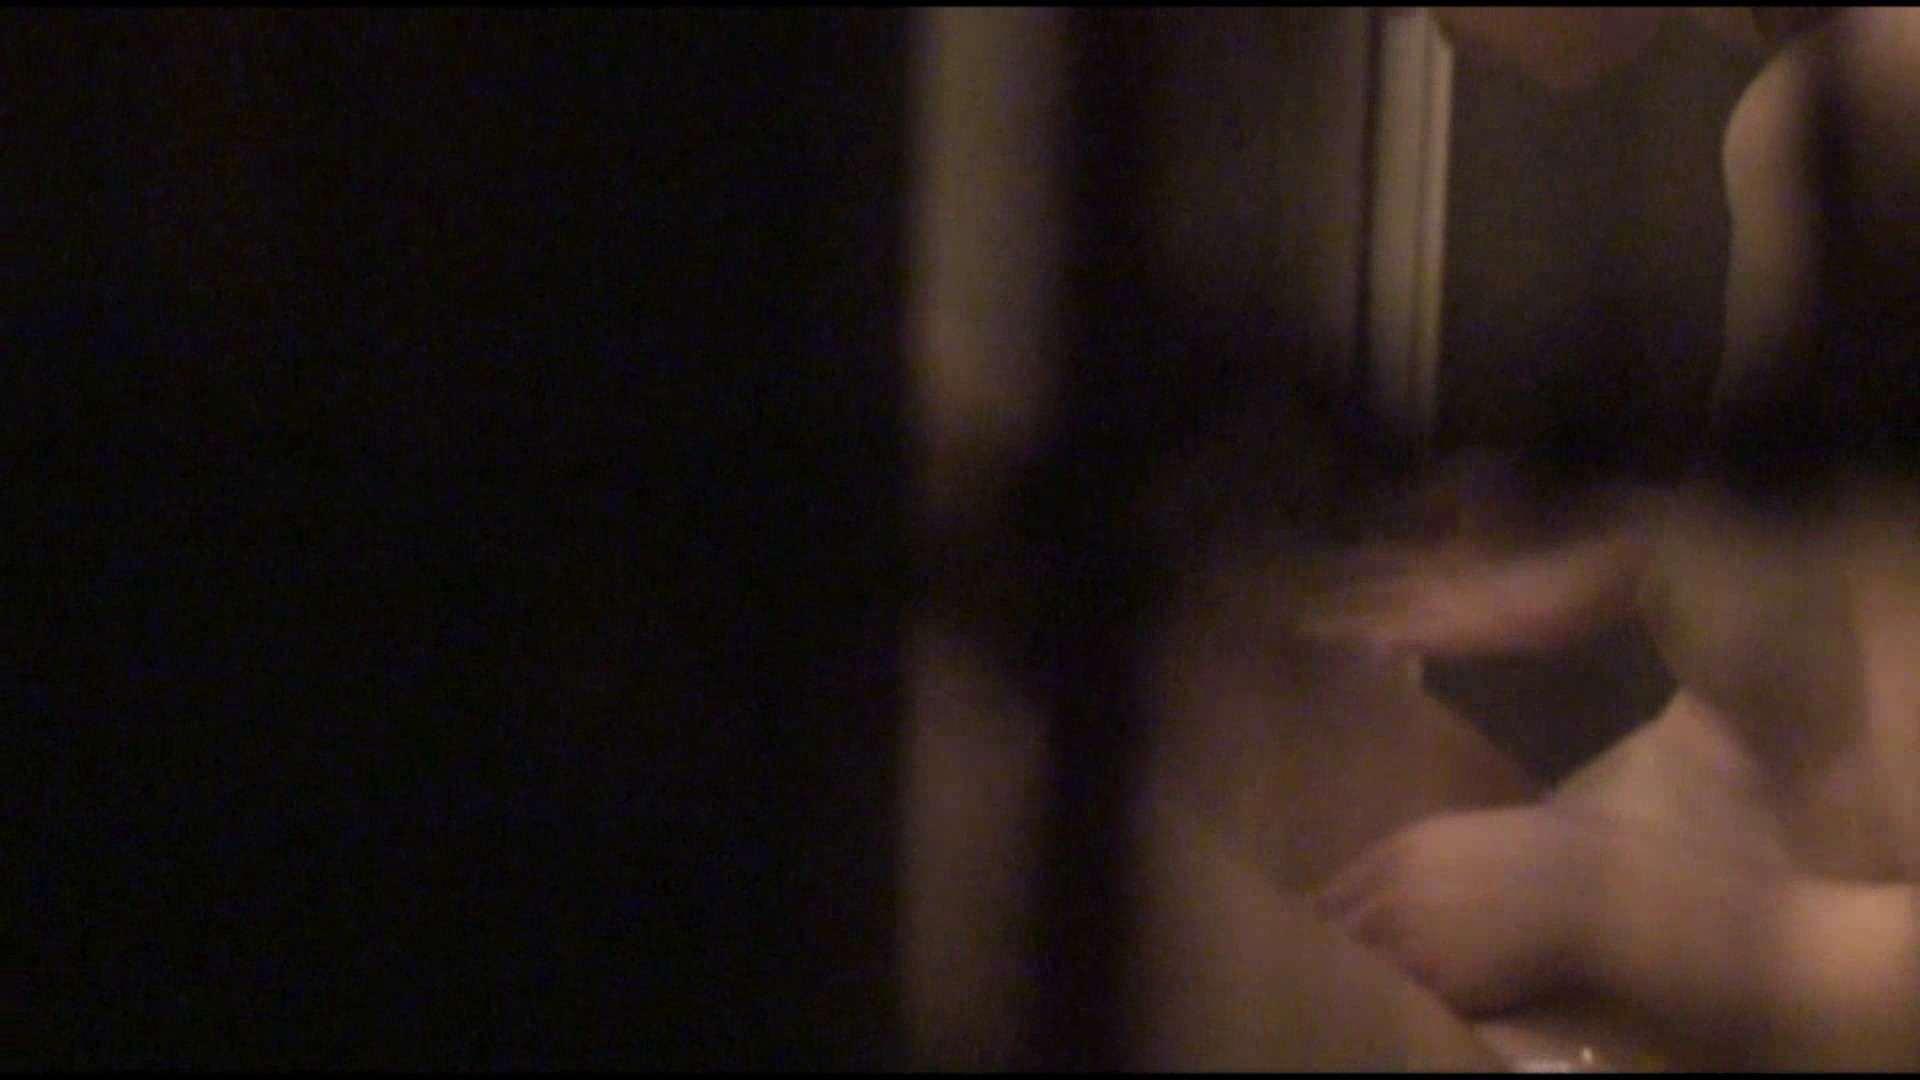 vol.05最高の極上美人!可愛い彼女の裸体をどうぞ!風呂上り鏡チェックも必見! 美人  68pic 39